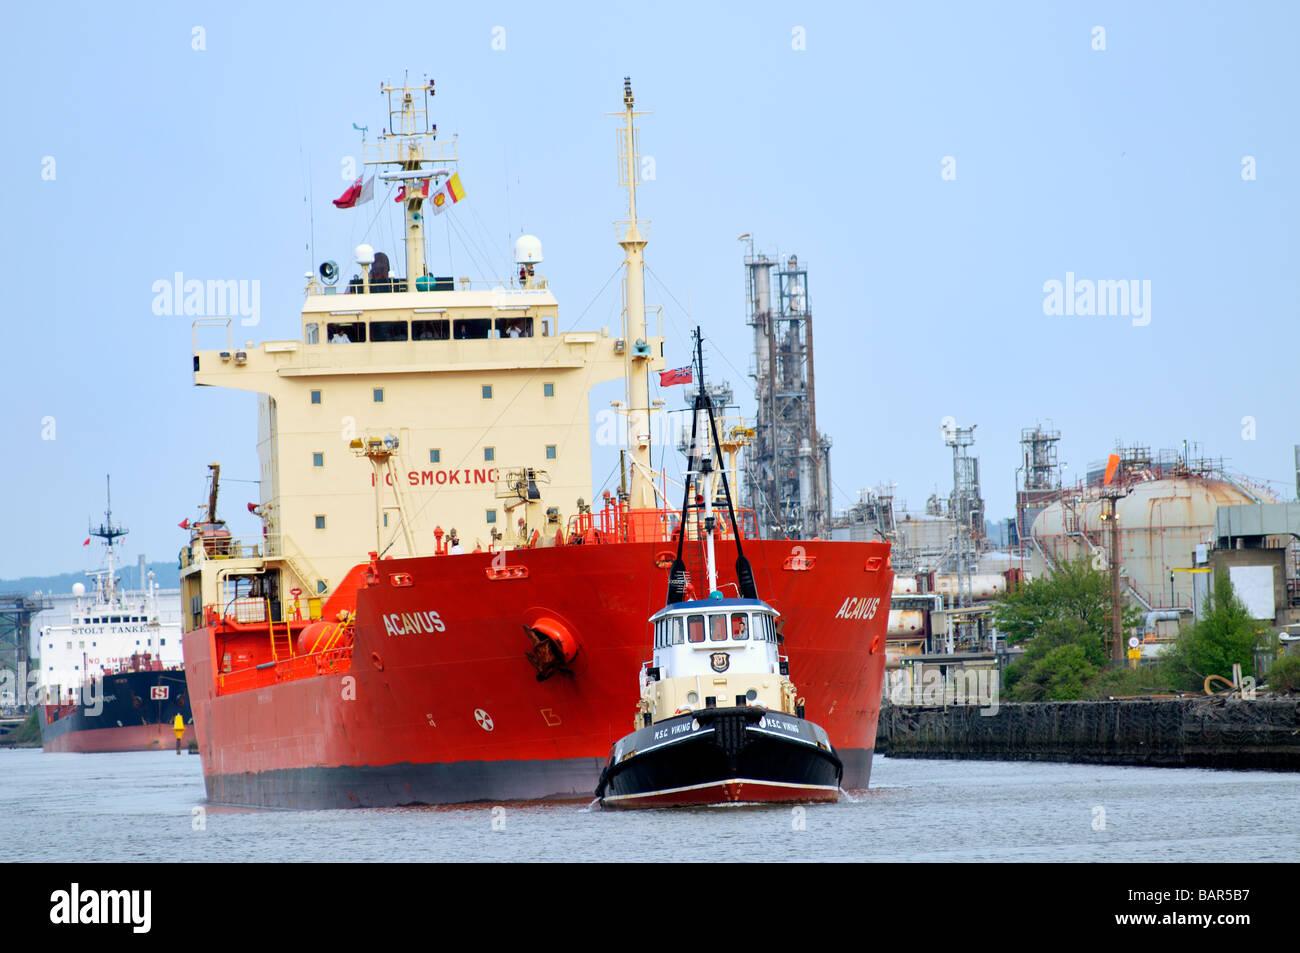 Tugboat MSC Viking guiding the bulk chemical oil products tanker Acavus - Stock Image